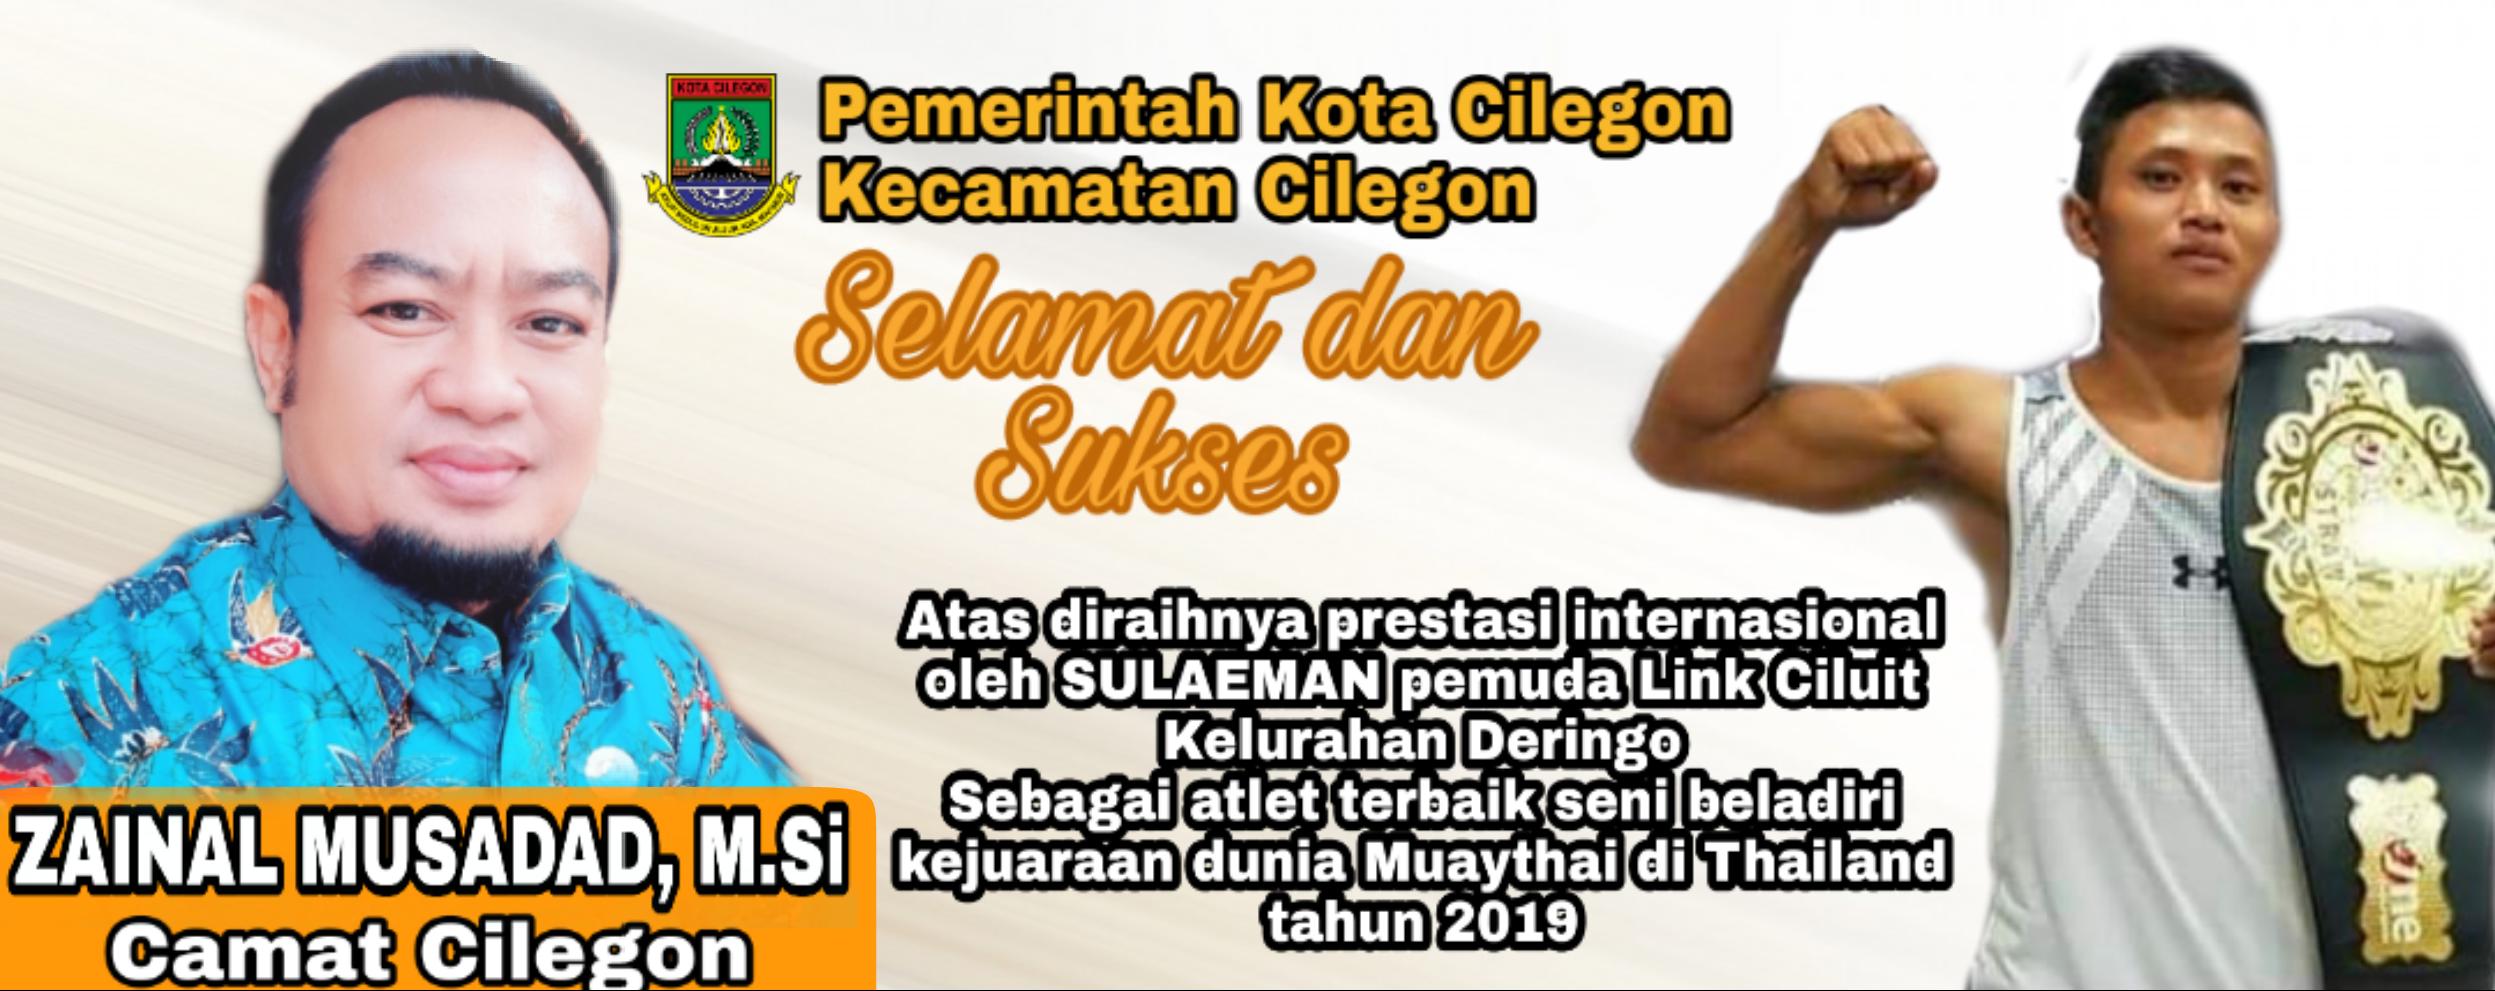 Camat Cilegon_sulaeman